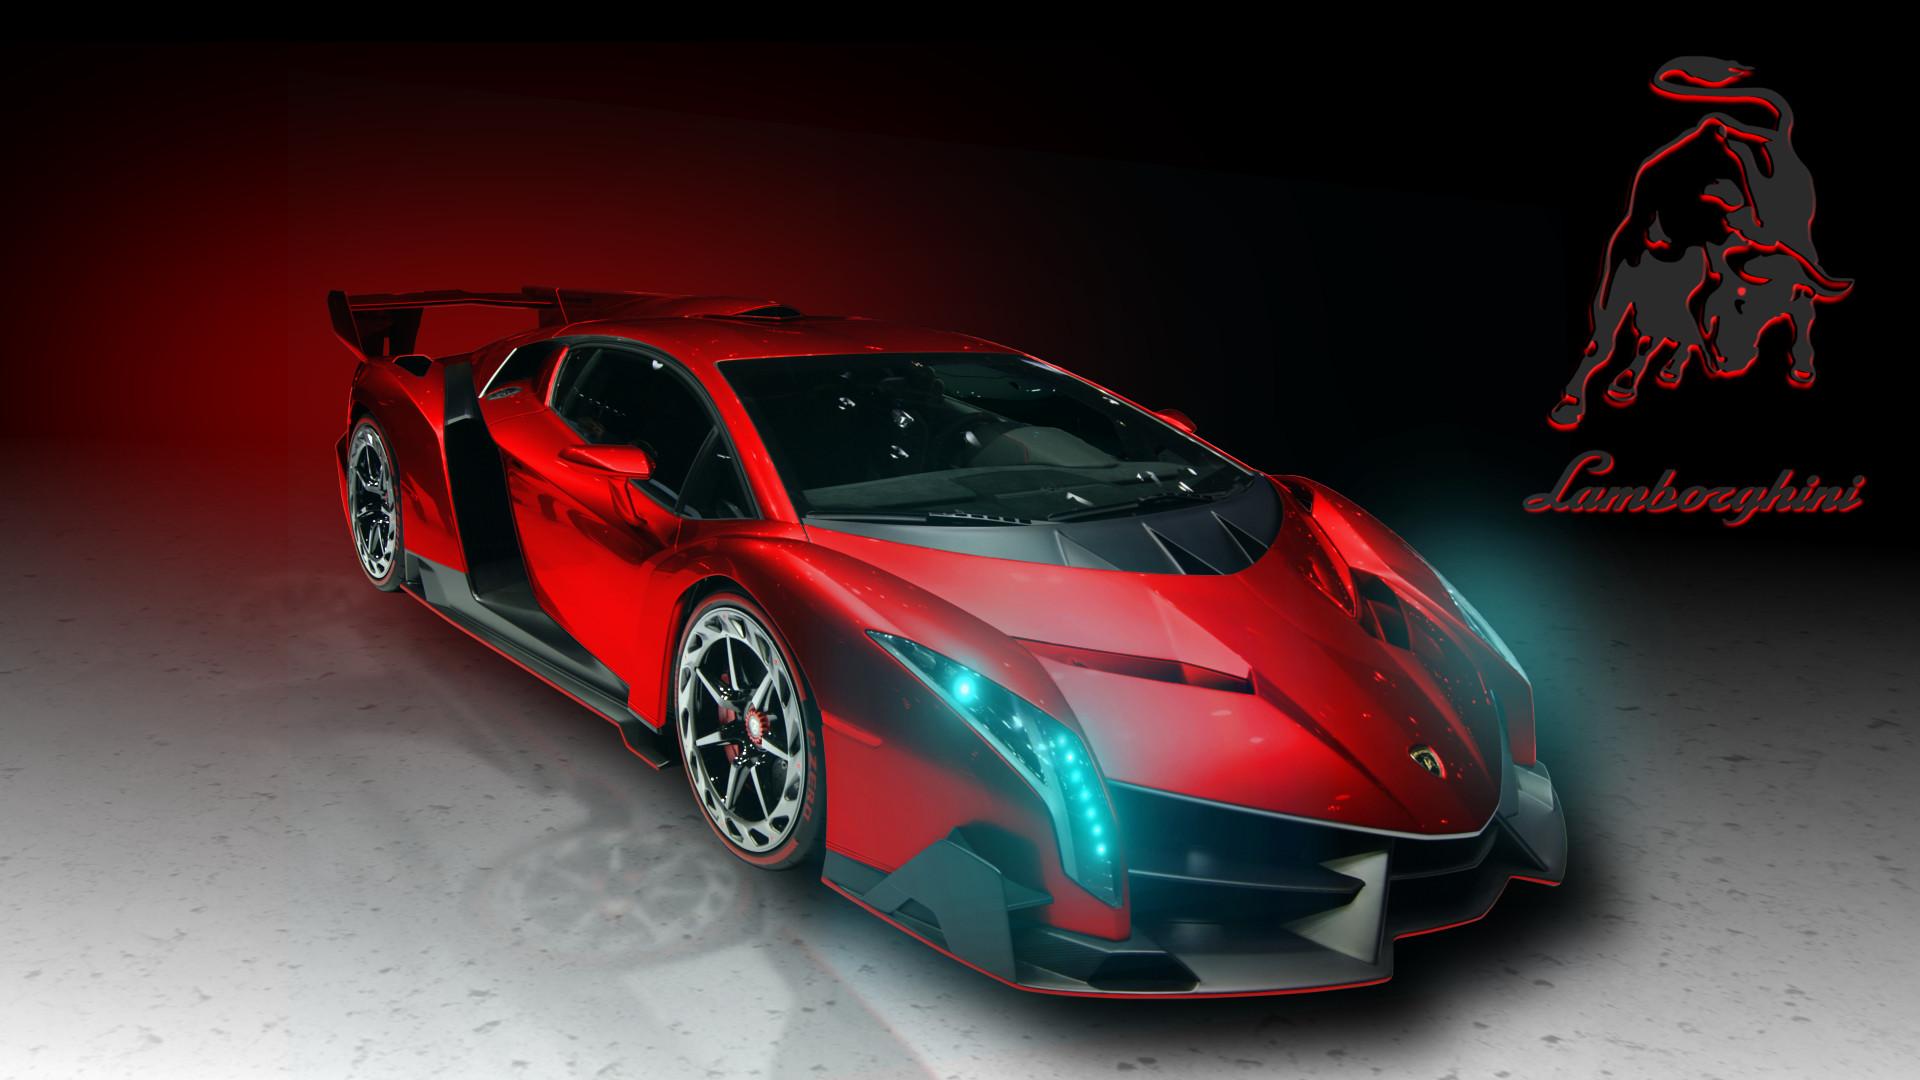 Lamborghini Veneno HD Wallpapers.